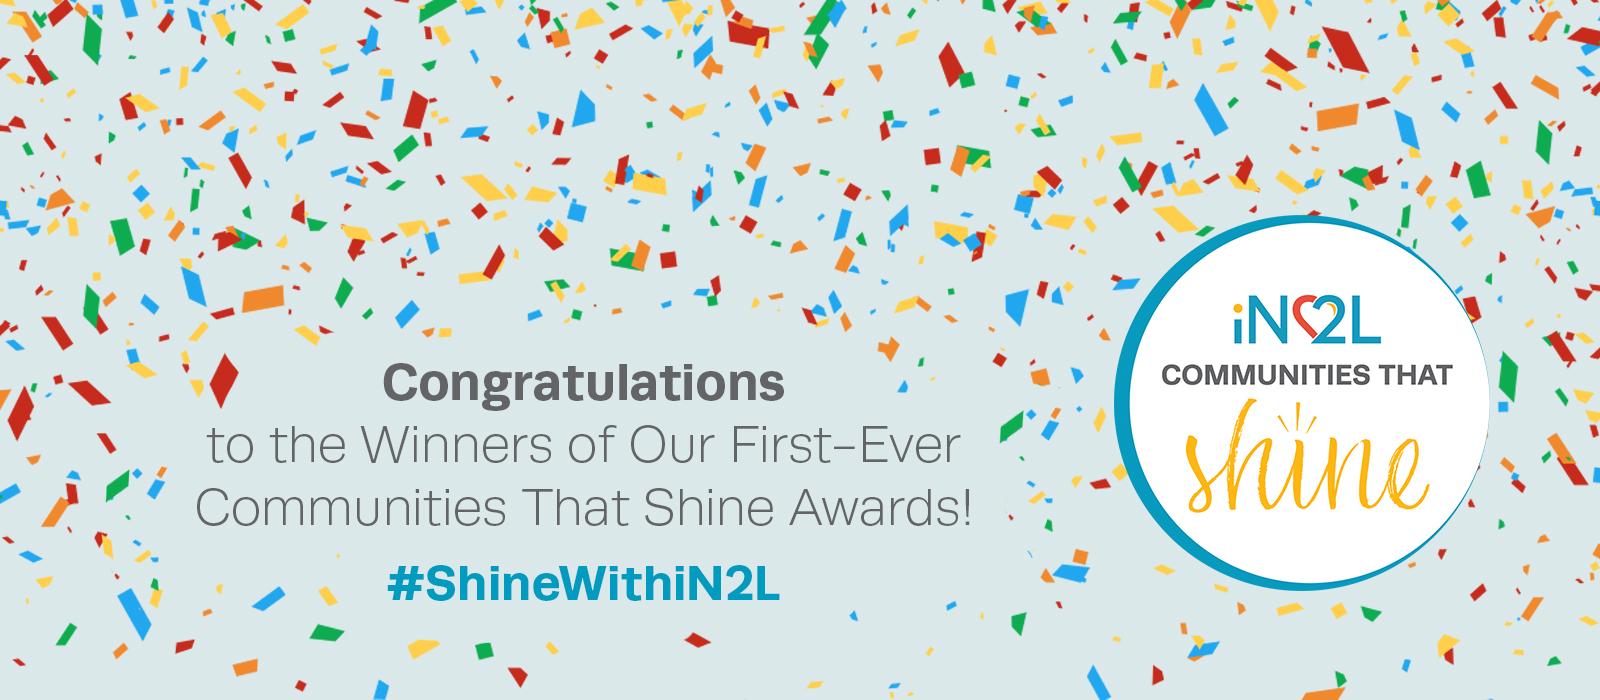 Communities That Shine Awards